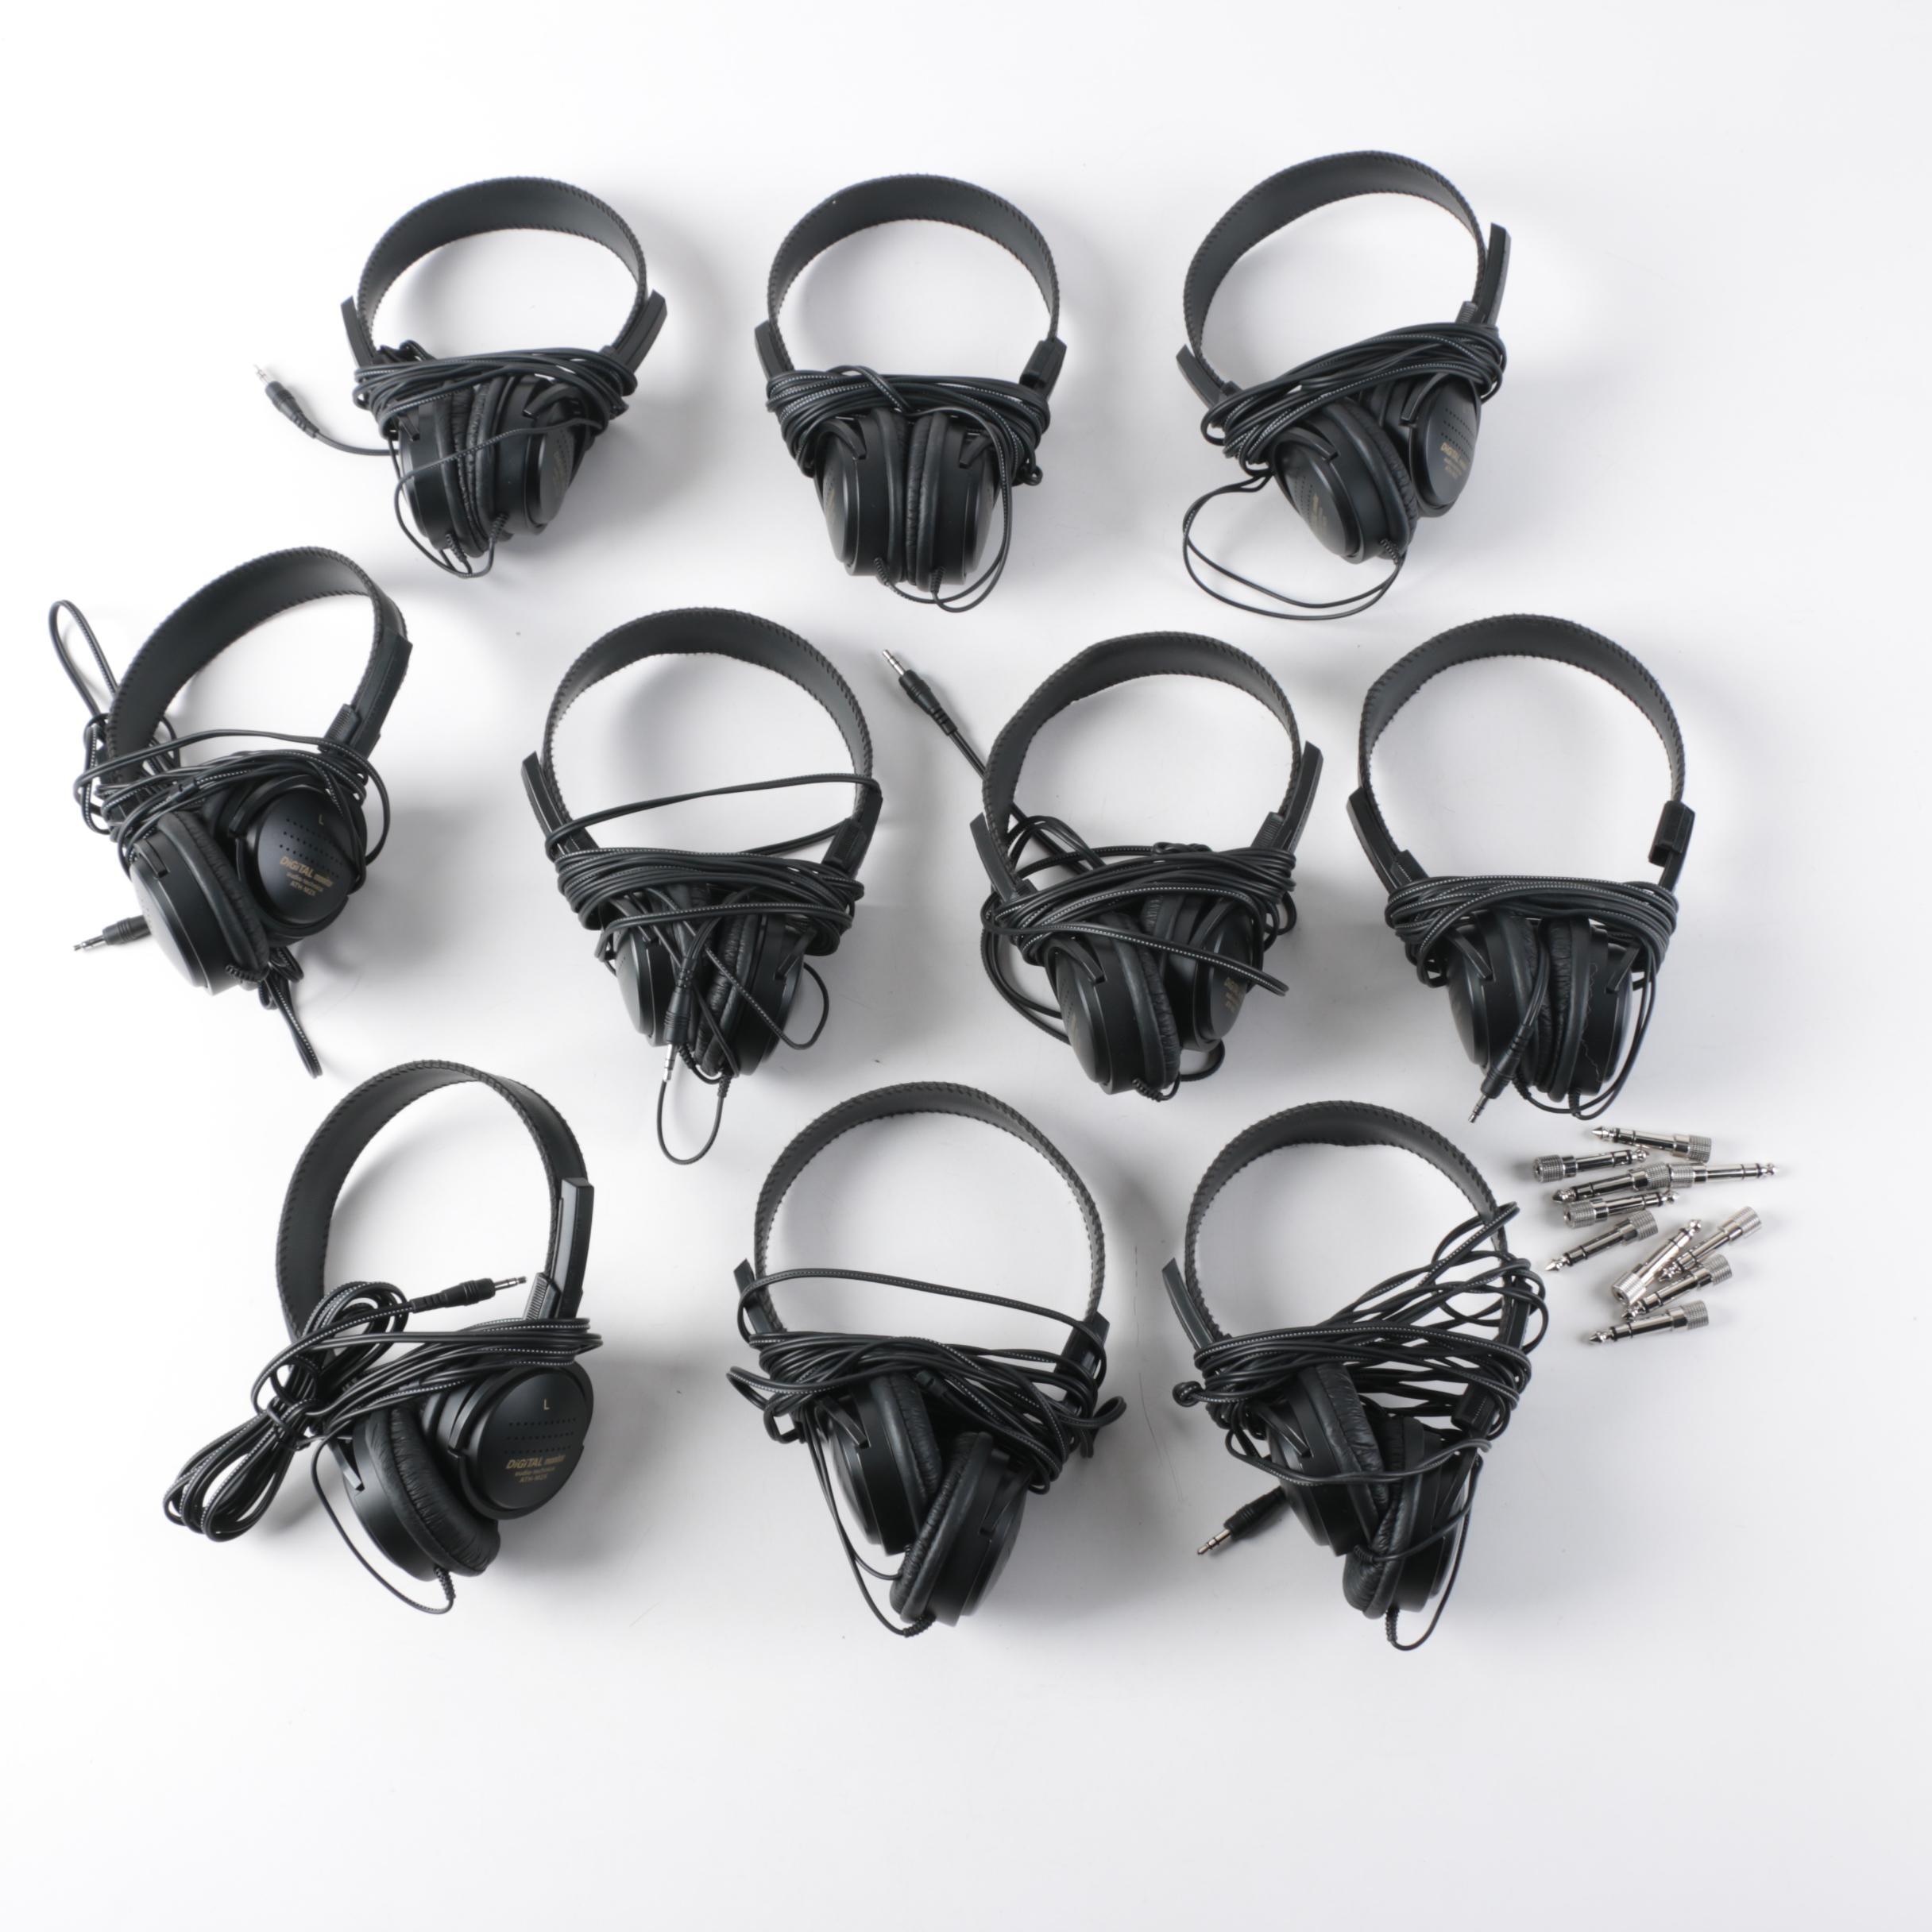 Audio-Technica ATH-M2X Headphones